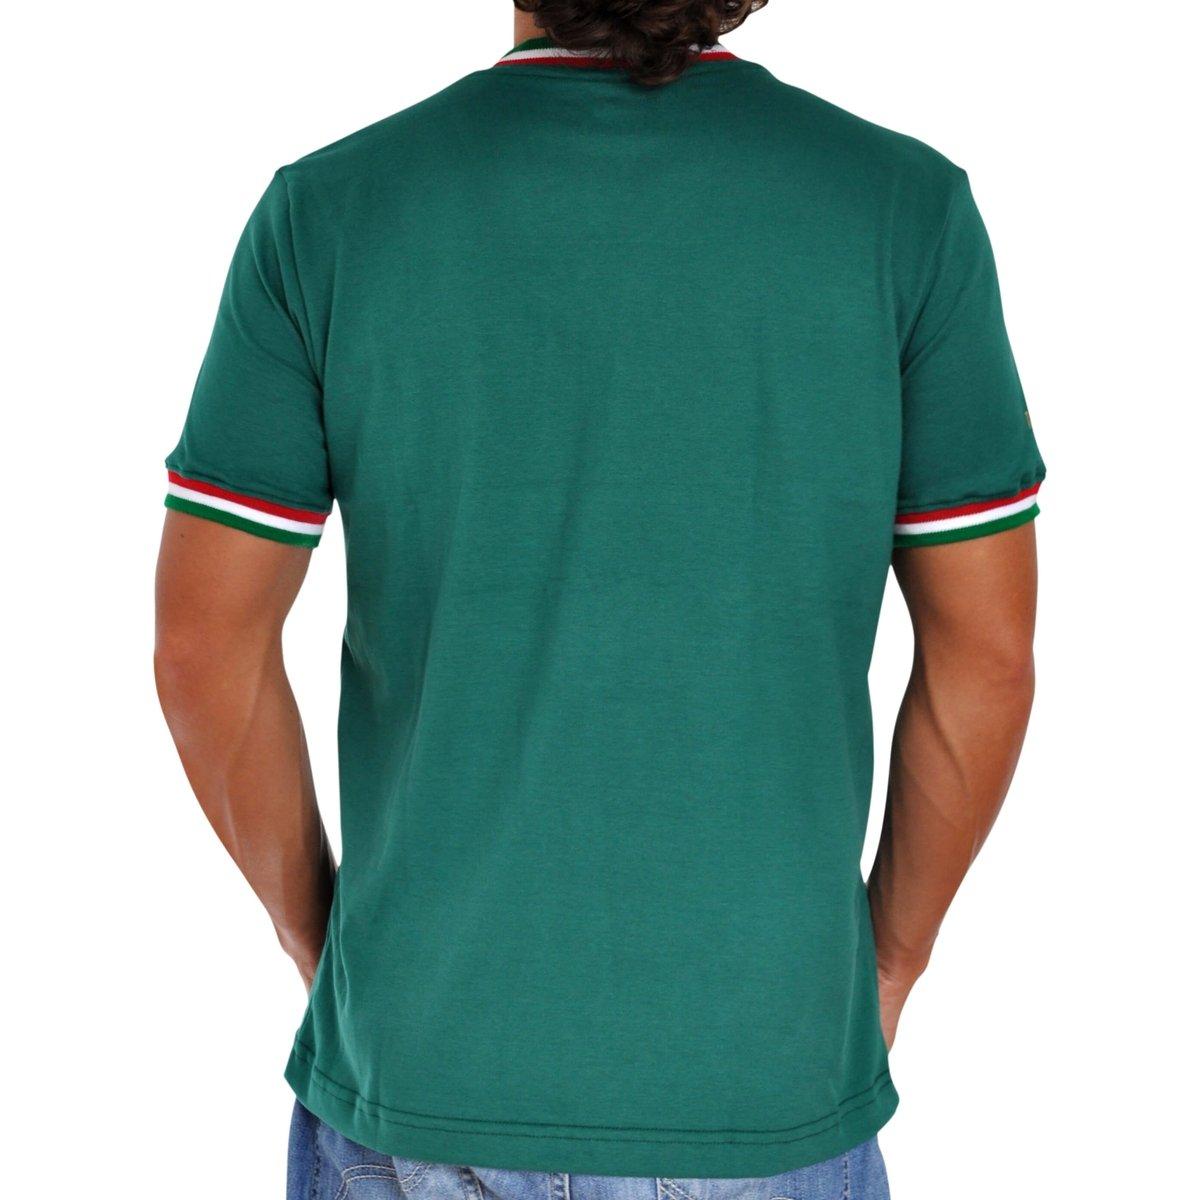 Camisa Retrô Mania México 1970 Masculina - Compre Agora  d4cf1a6785159